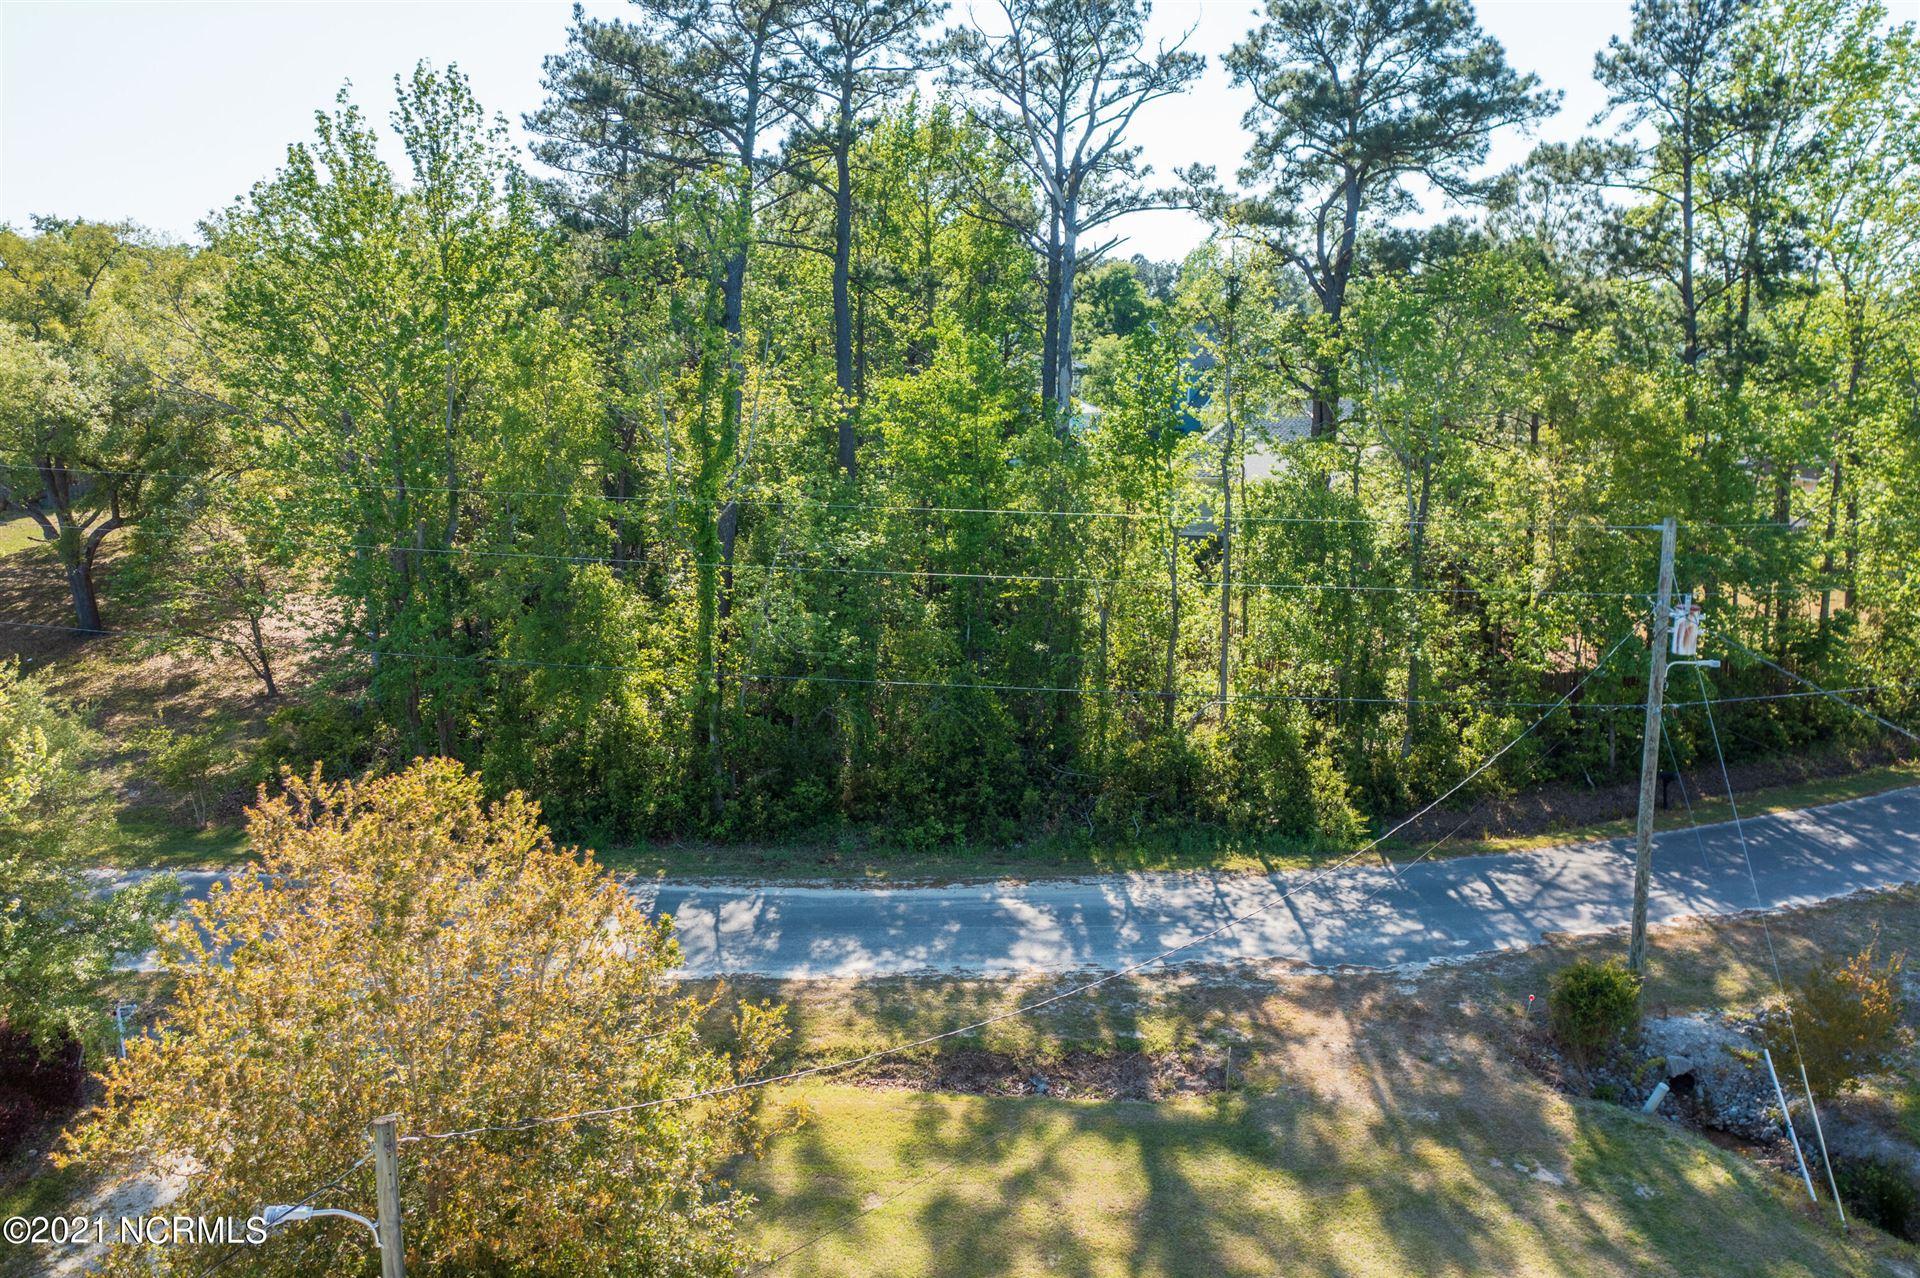 Photo of Lot 20 Beckys Creek, Hampstead, NC 28443 (MLS # 100267258)